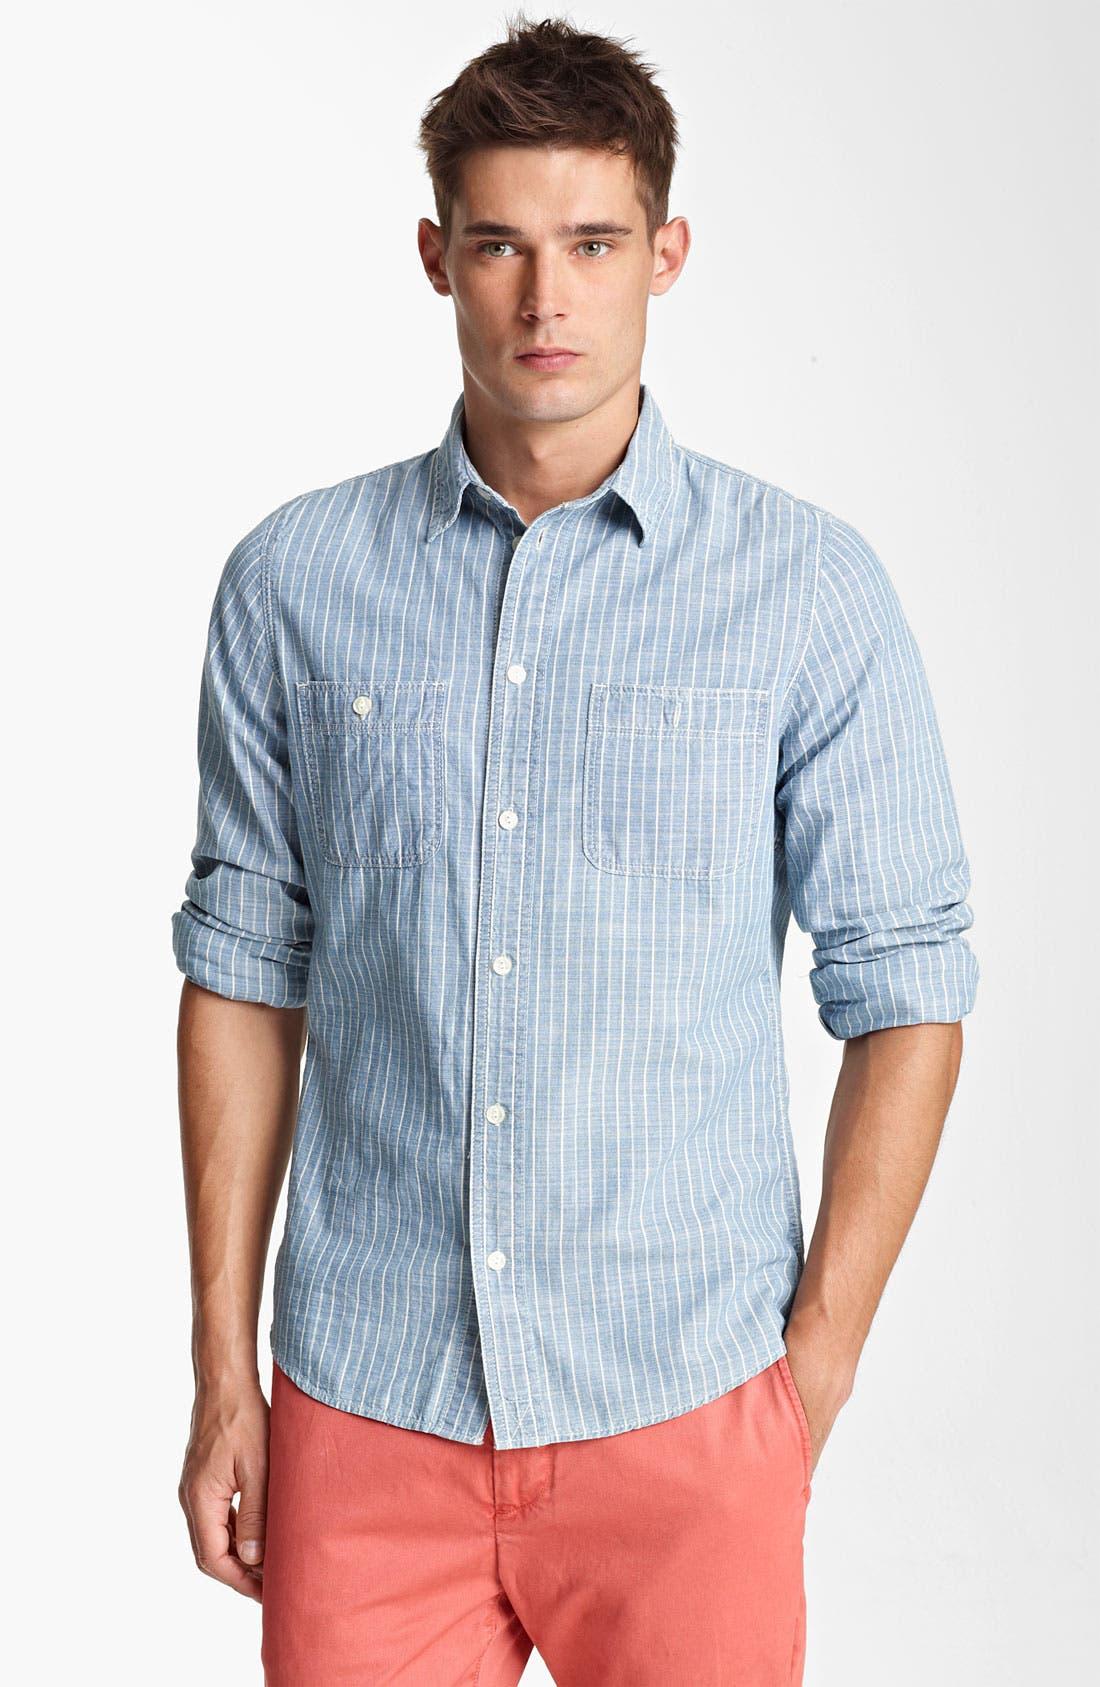 Main Image - Jack Spade 'Boomer' Stripe Work Shirt